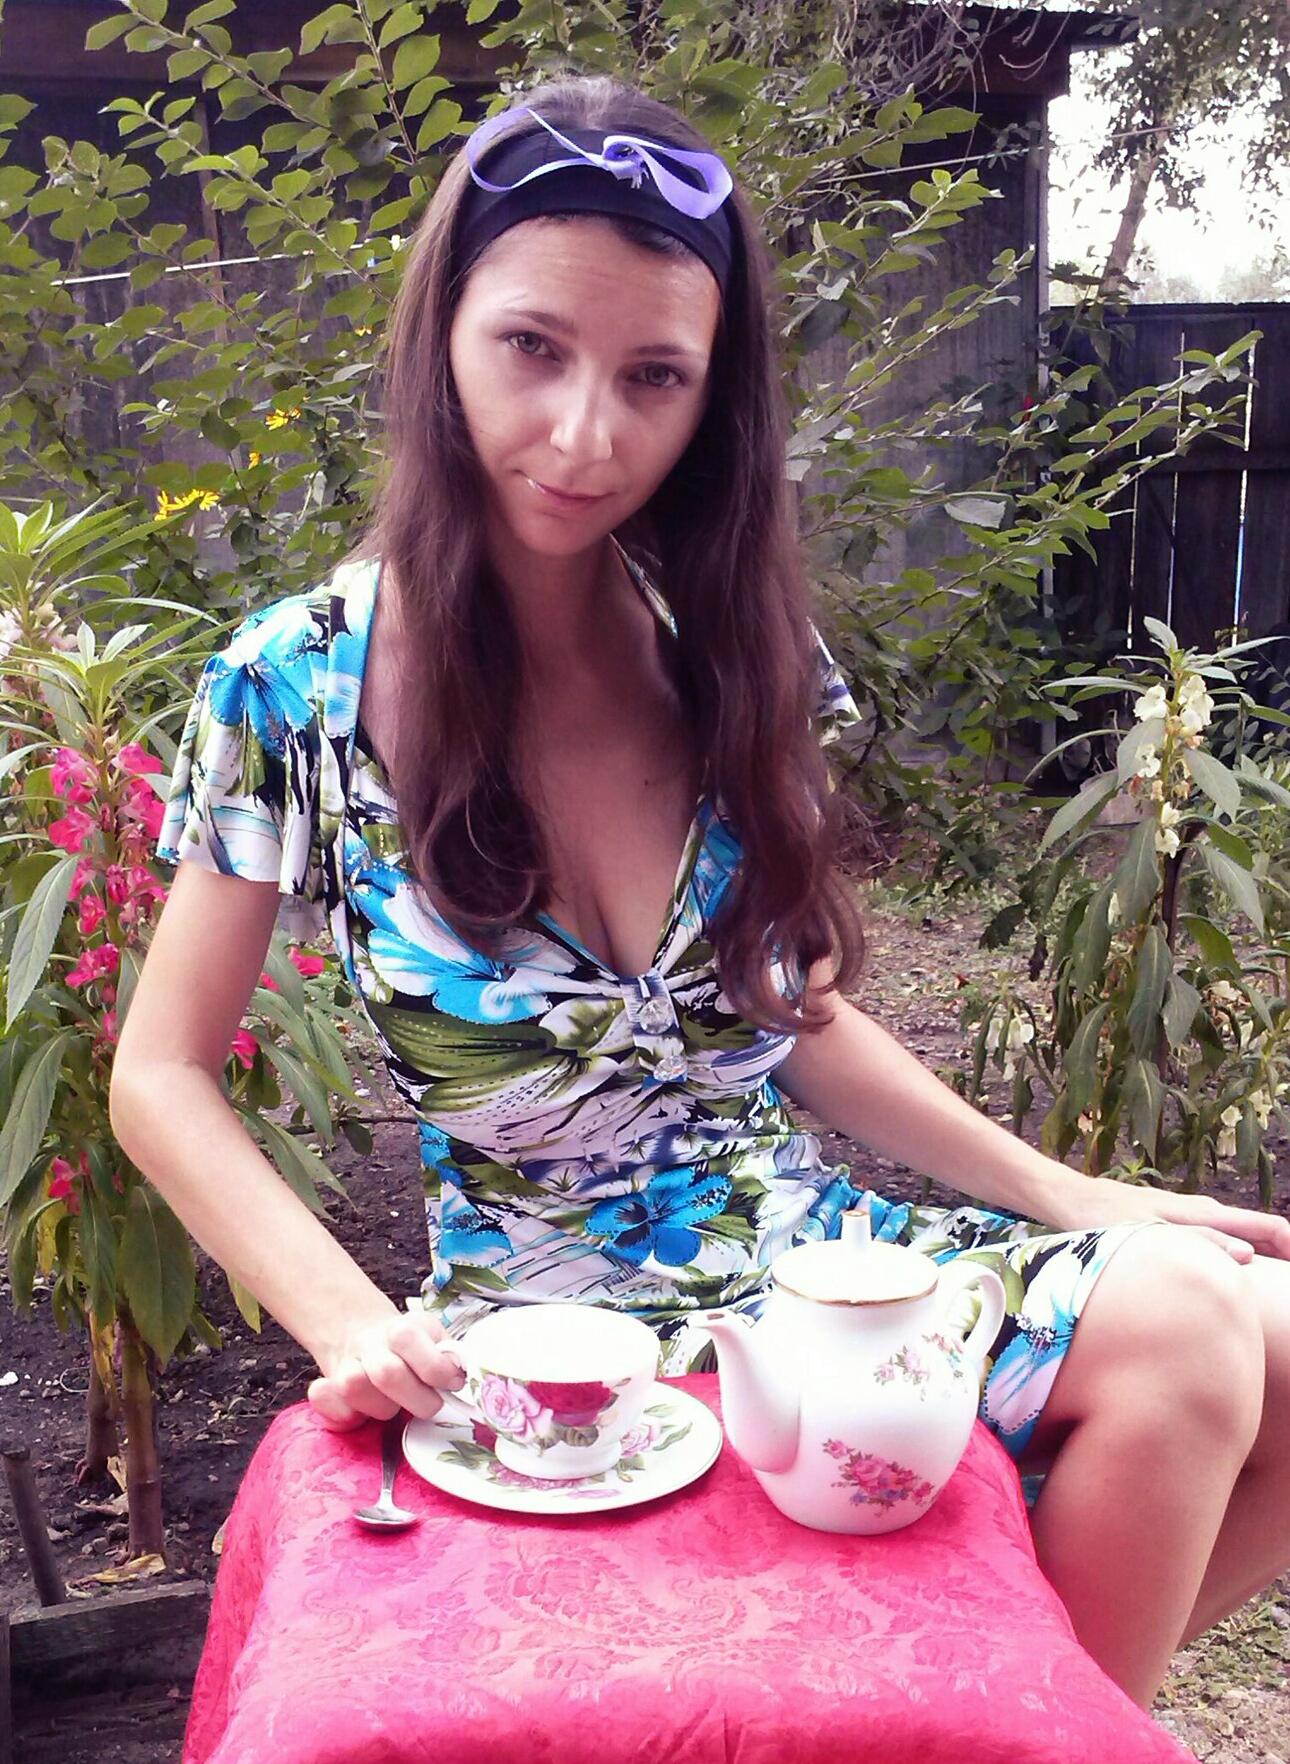 Алиса в стране чудес)). За чашкой чая